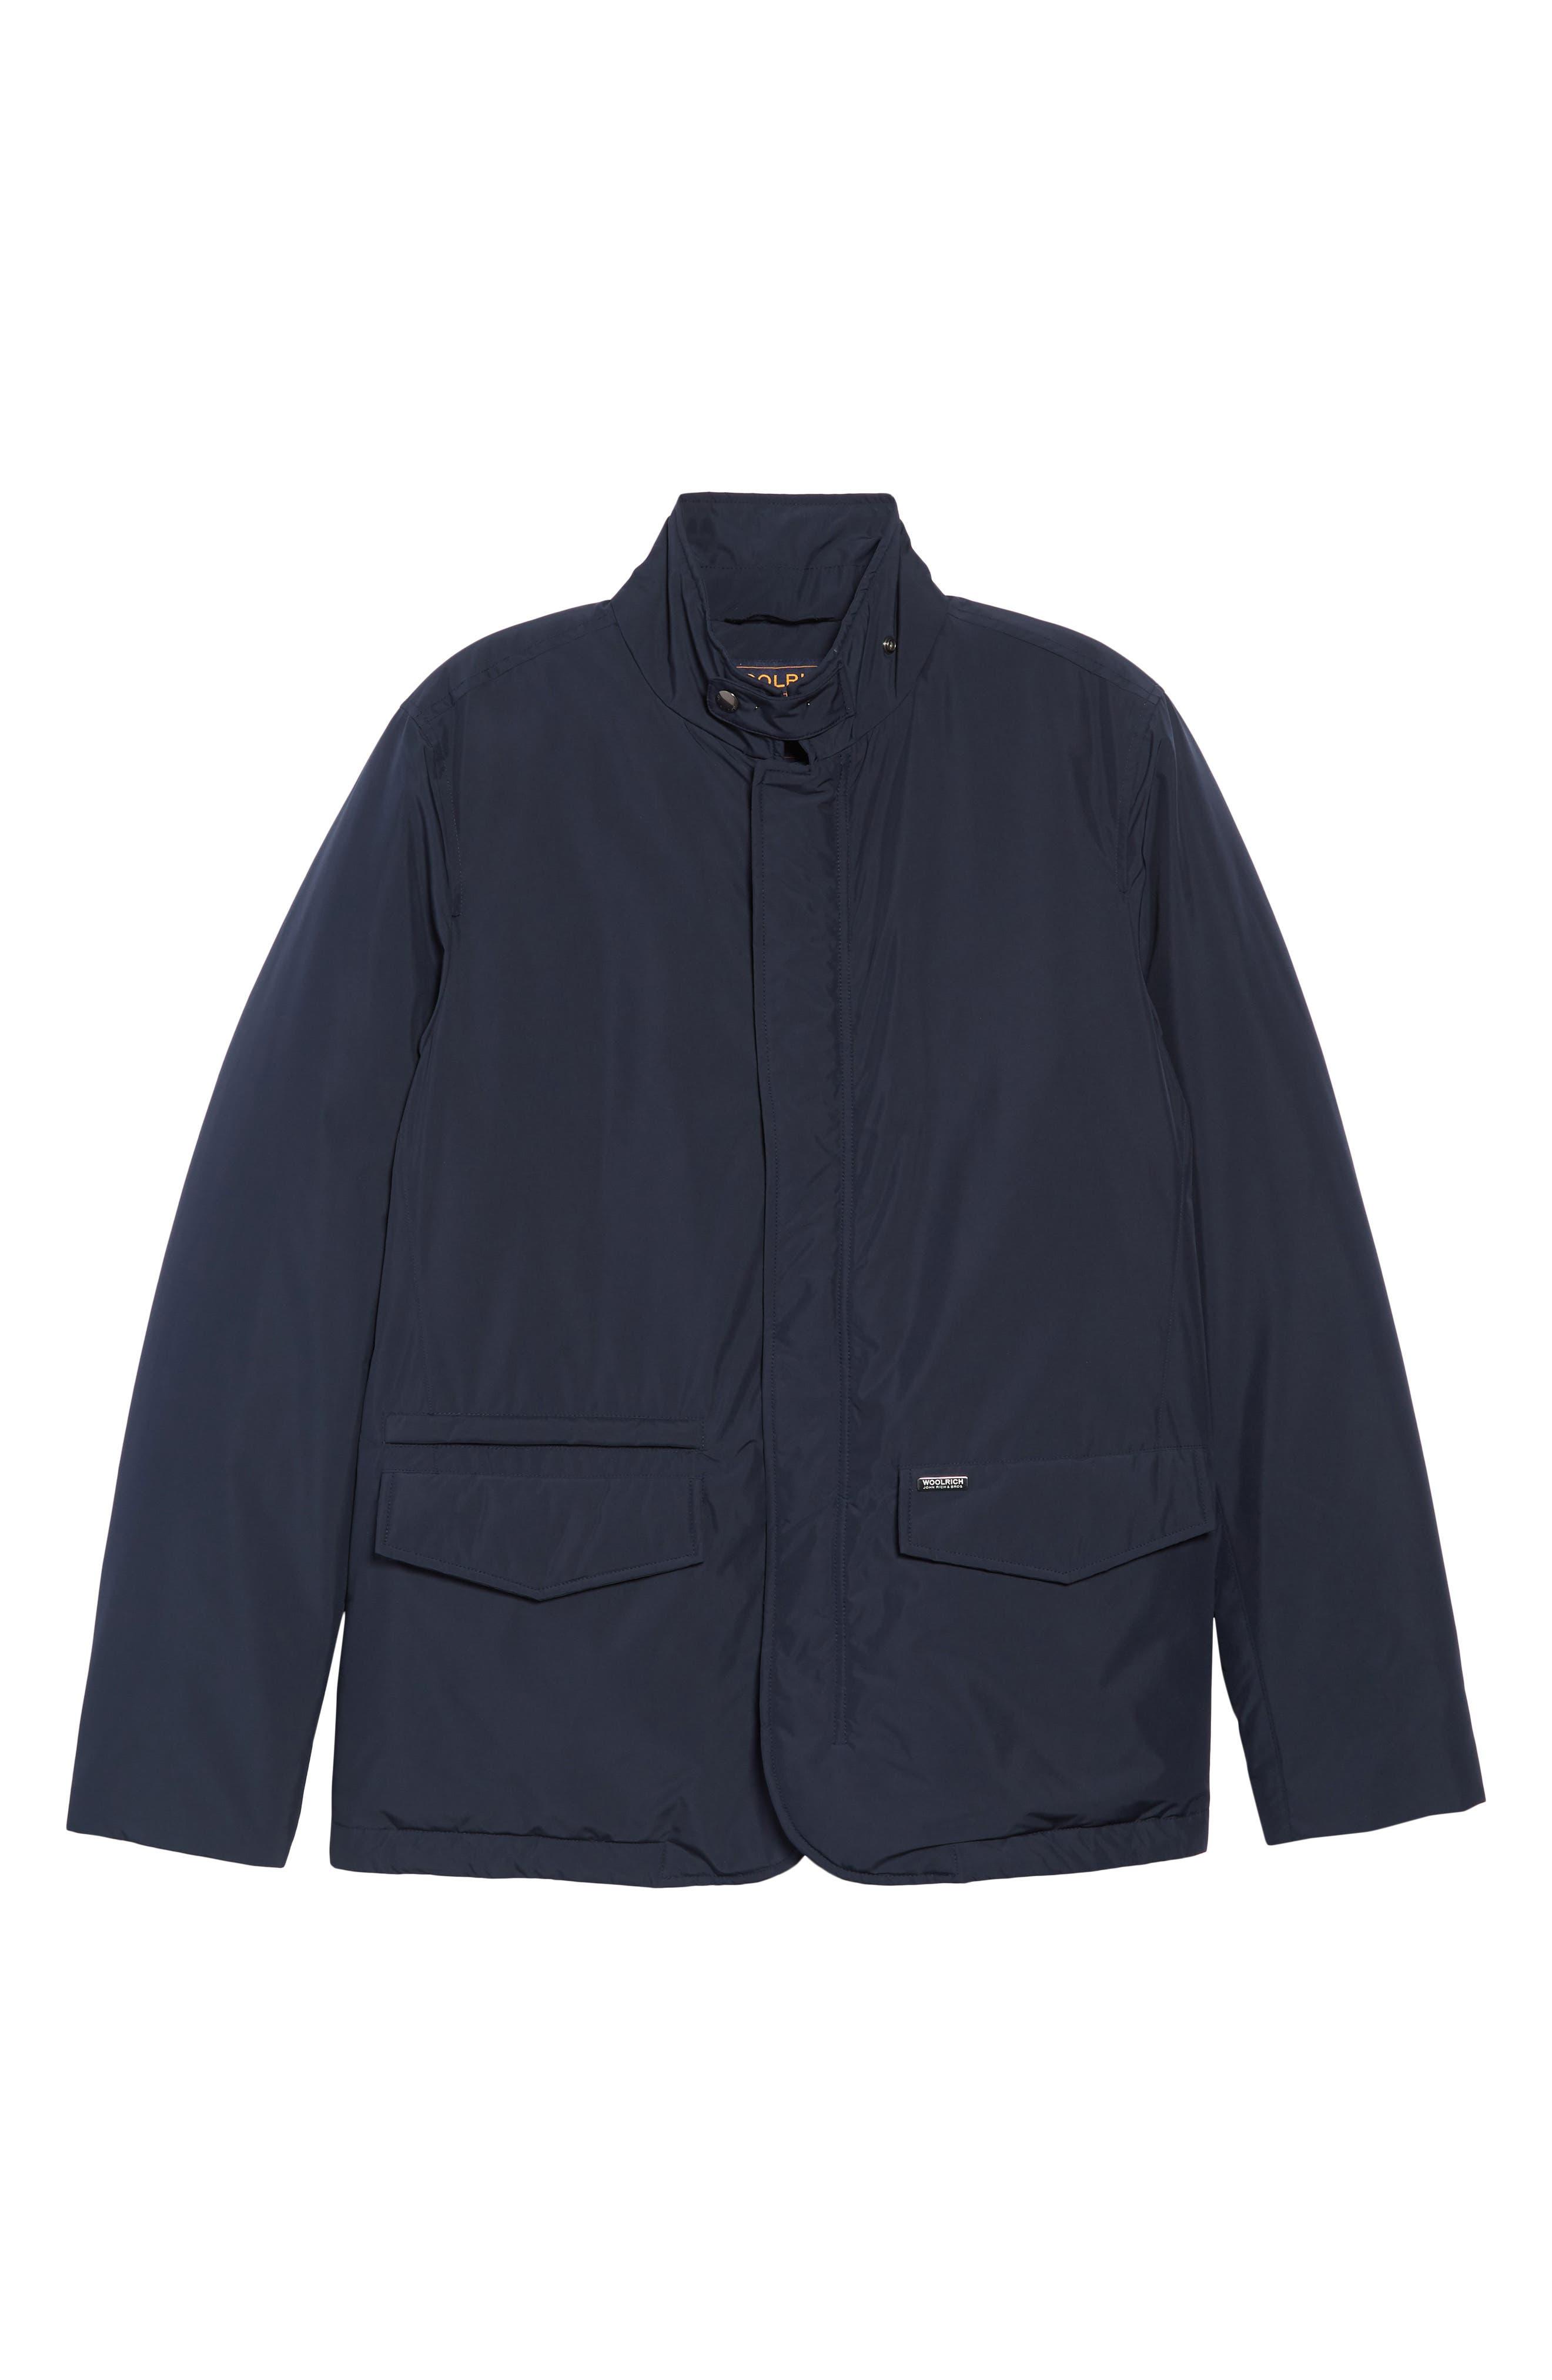 City Down Jacket,                             Alternate thumbnail 5, color,                             MELTON BLUE